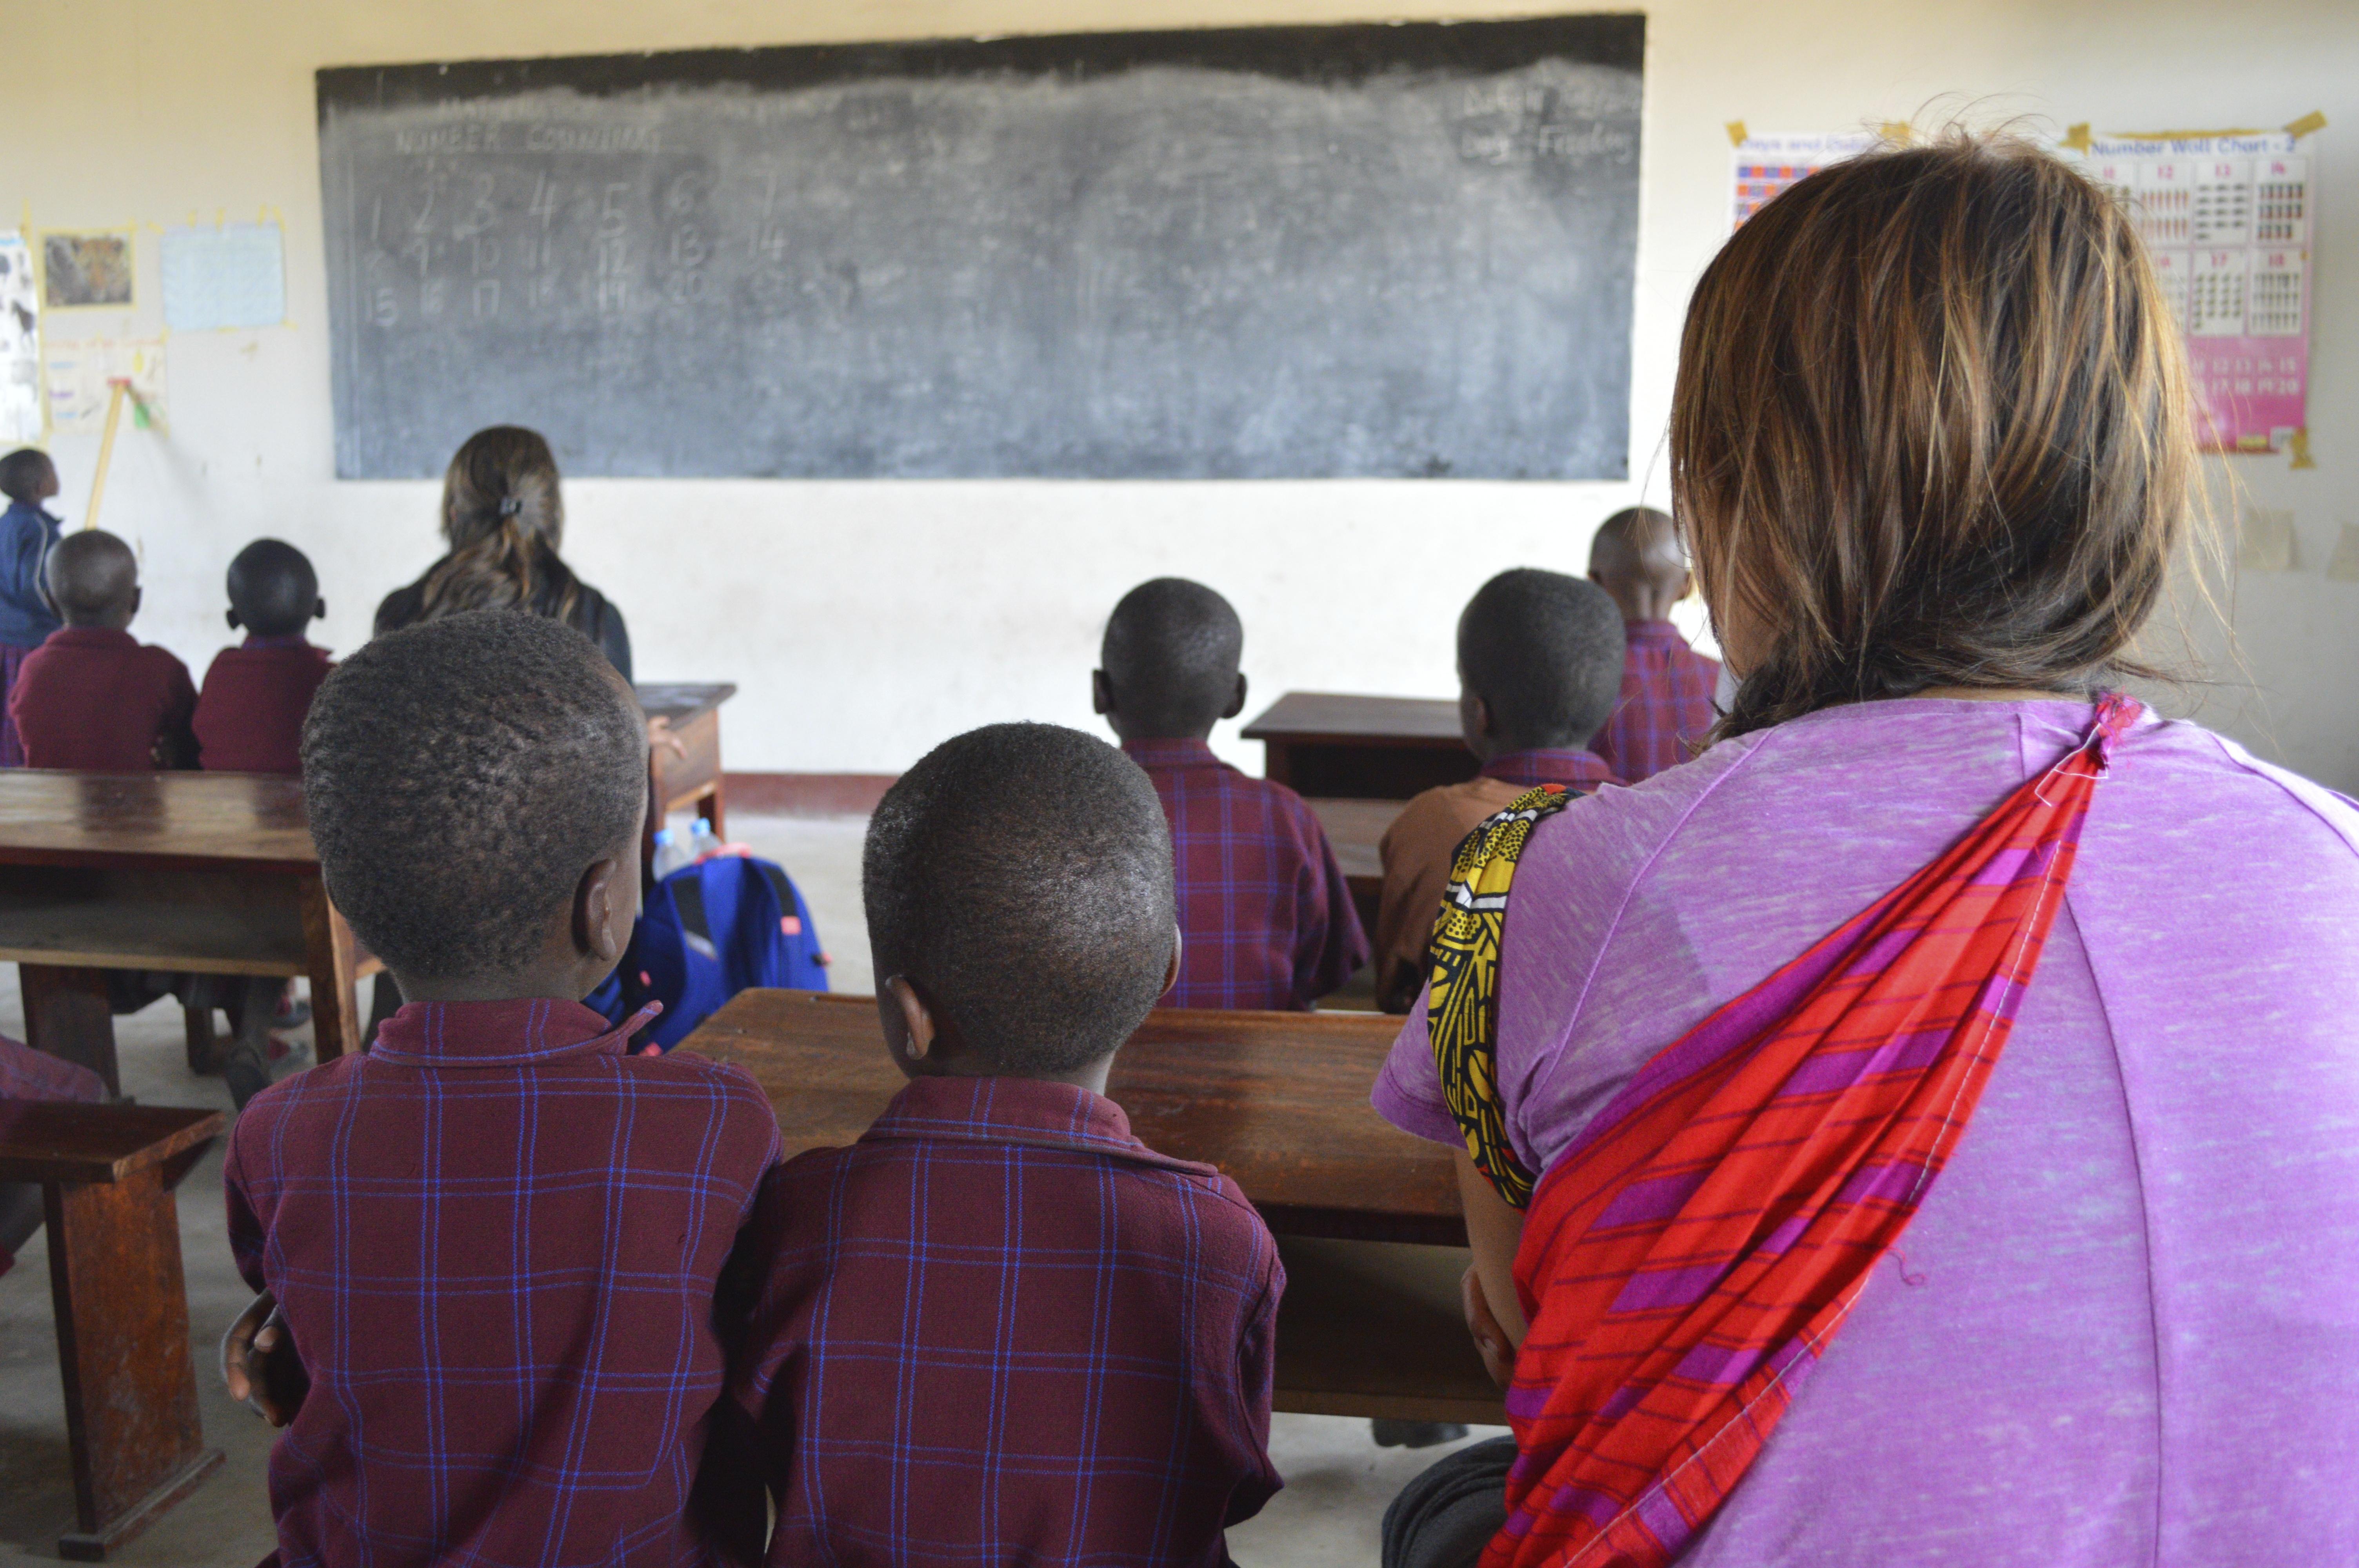 Summer Program - Adventure/Trips | Global Leadership Adventures: Tanzania - Children's Education Adventure